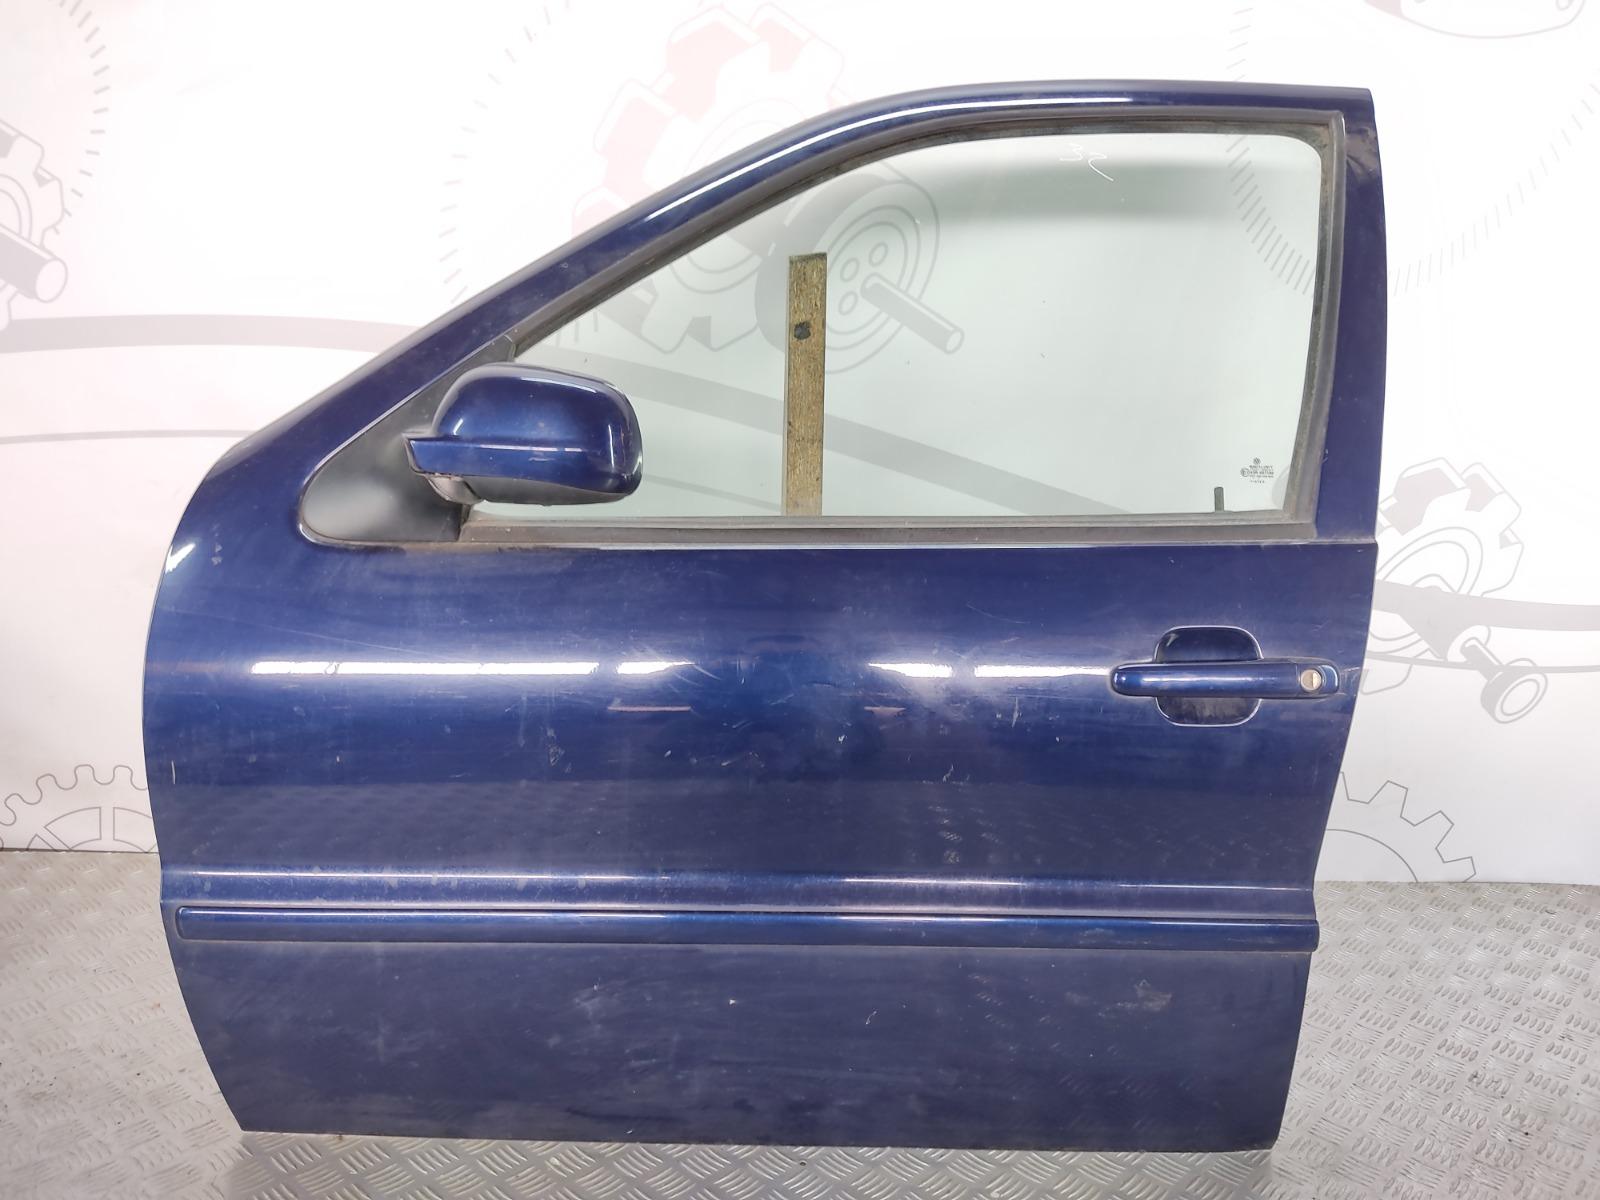 Дверь передняя левая Volkswagen Polo 1.4 MPI 2001 (б/у)